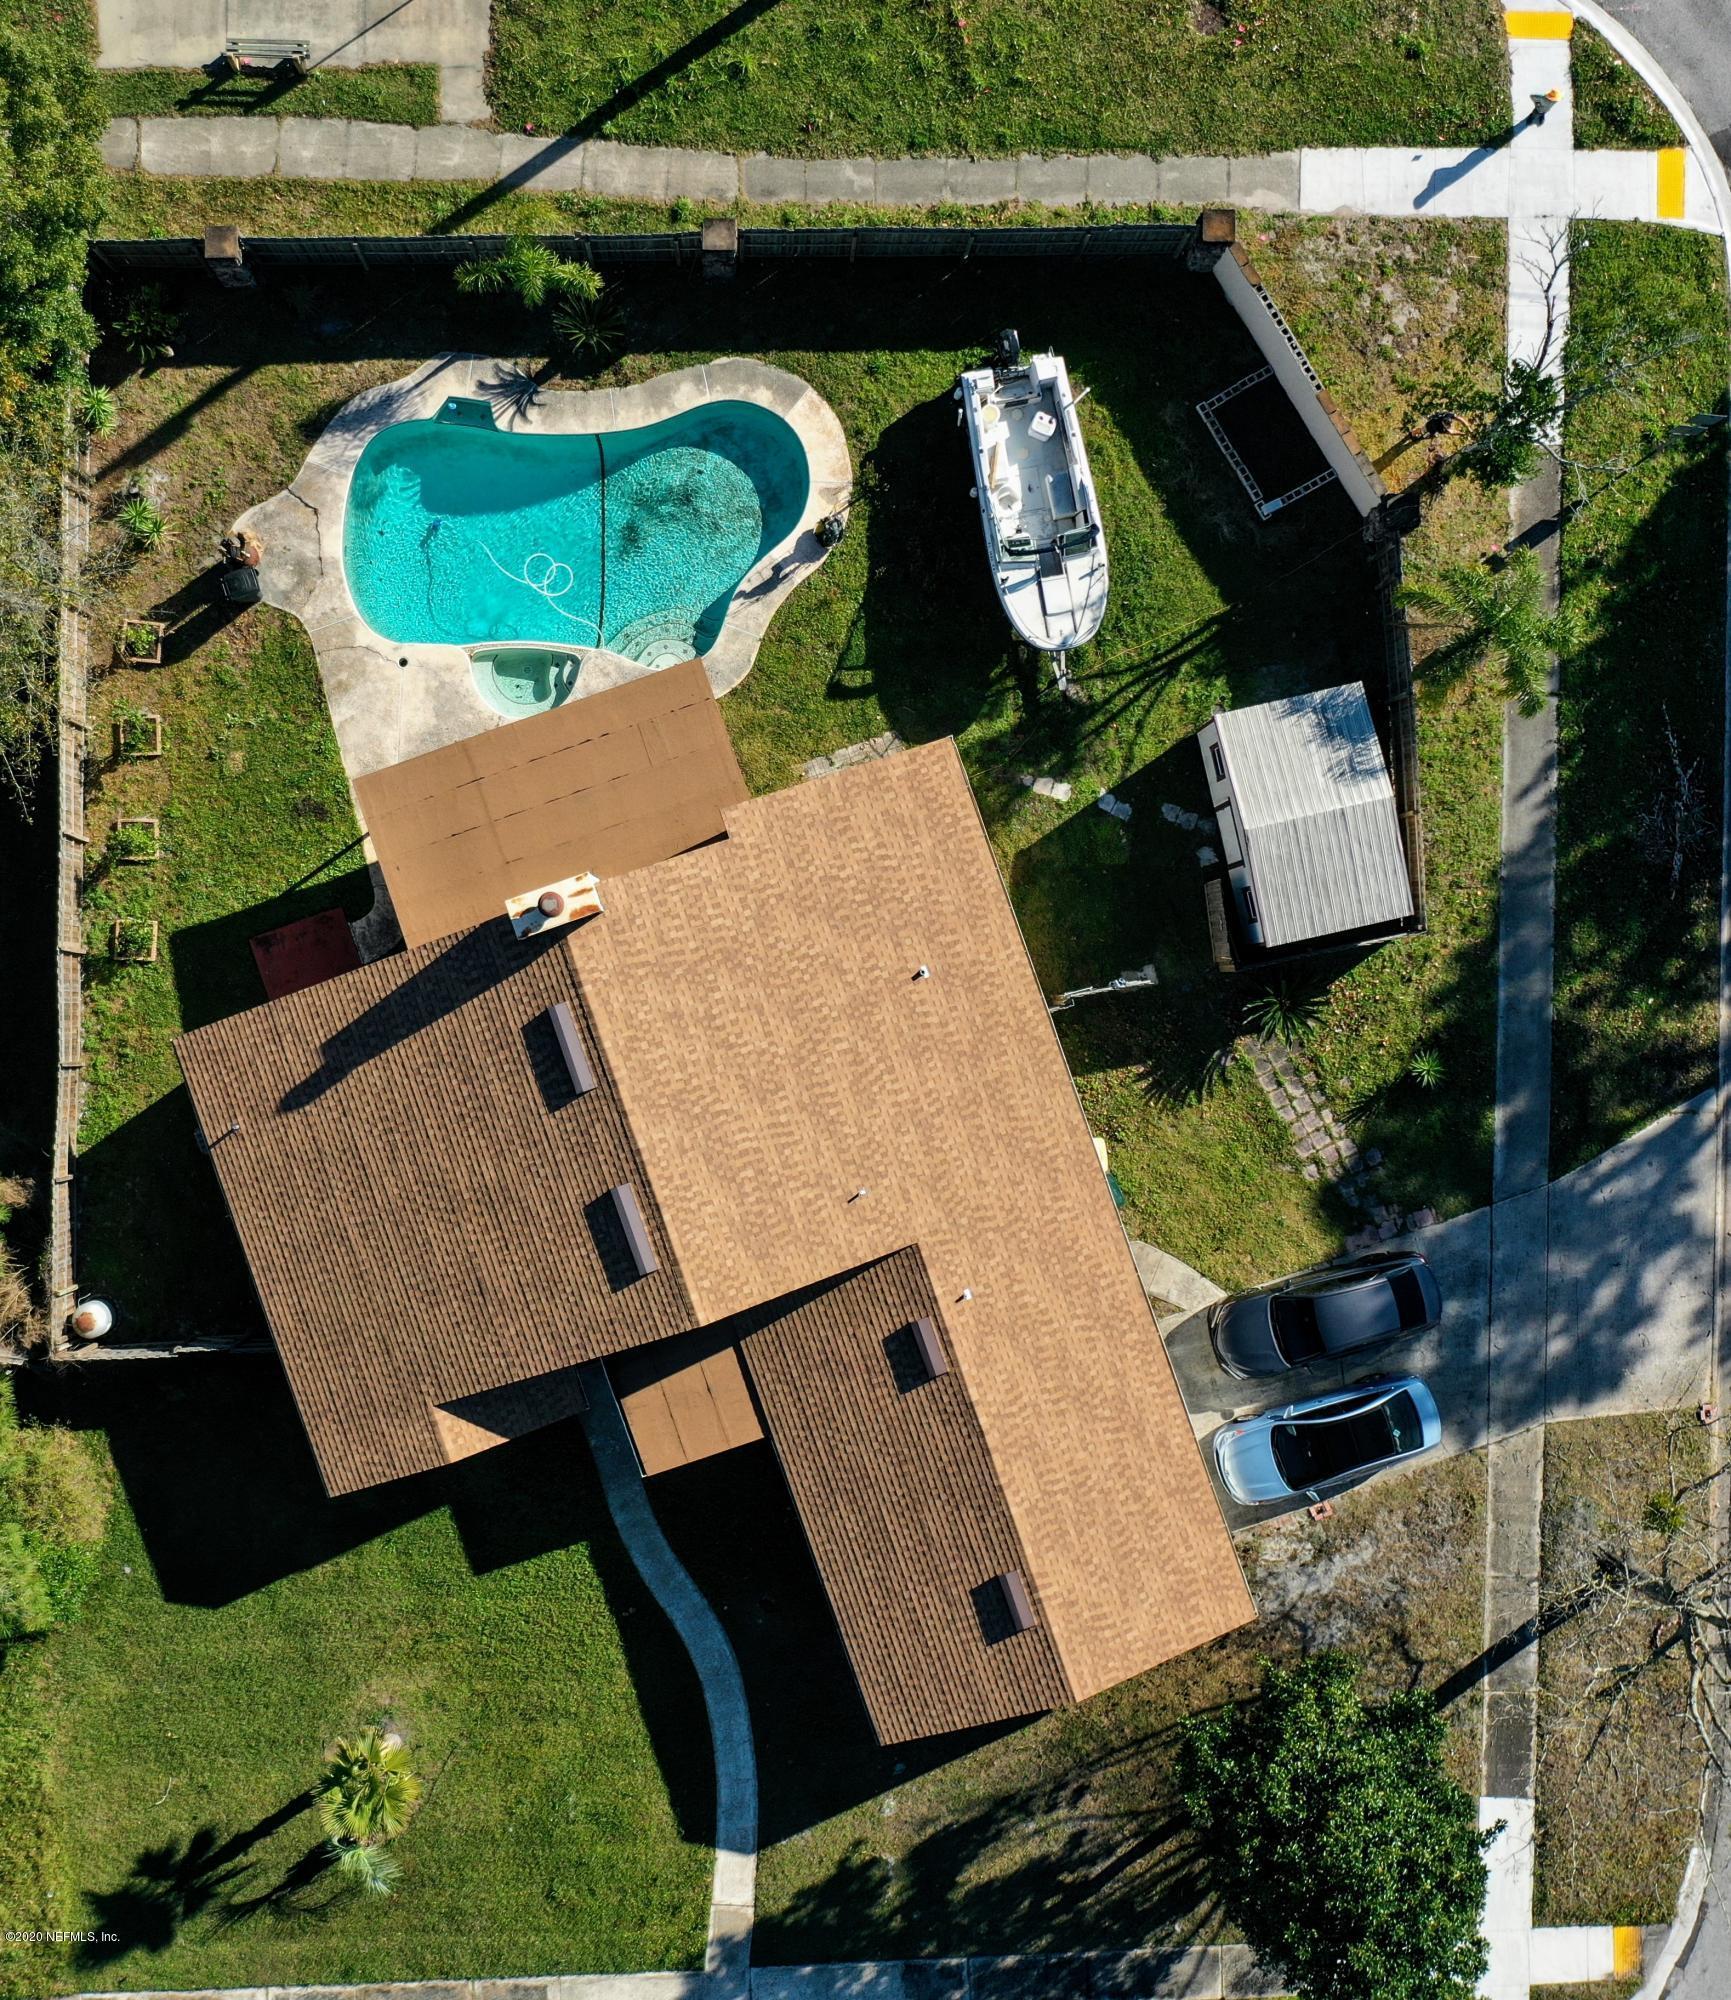 2603 SUMMER TREE, JACKSONVILLE, FLORIDA 32246, 3 Bedrooms Bedrooms, ,2 BathroomsBathrooms,Residential,For sale,SUMMER TREE,1063781